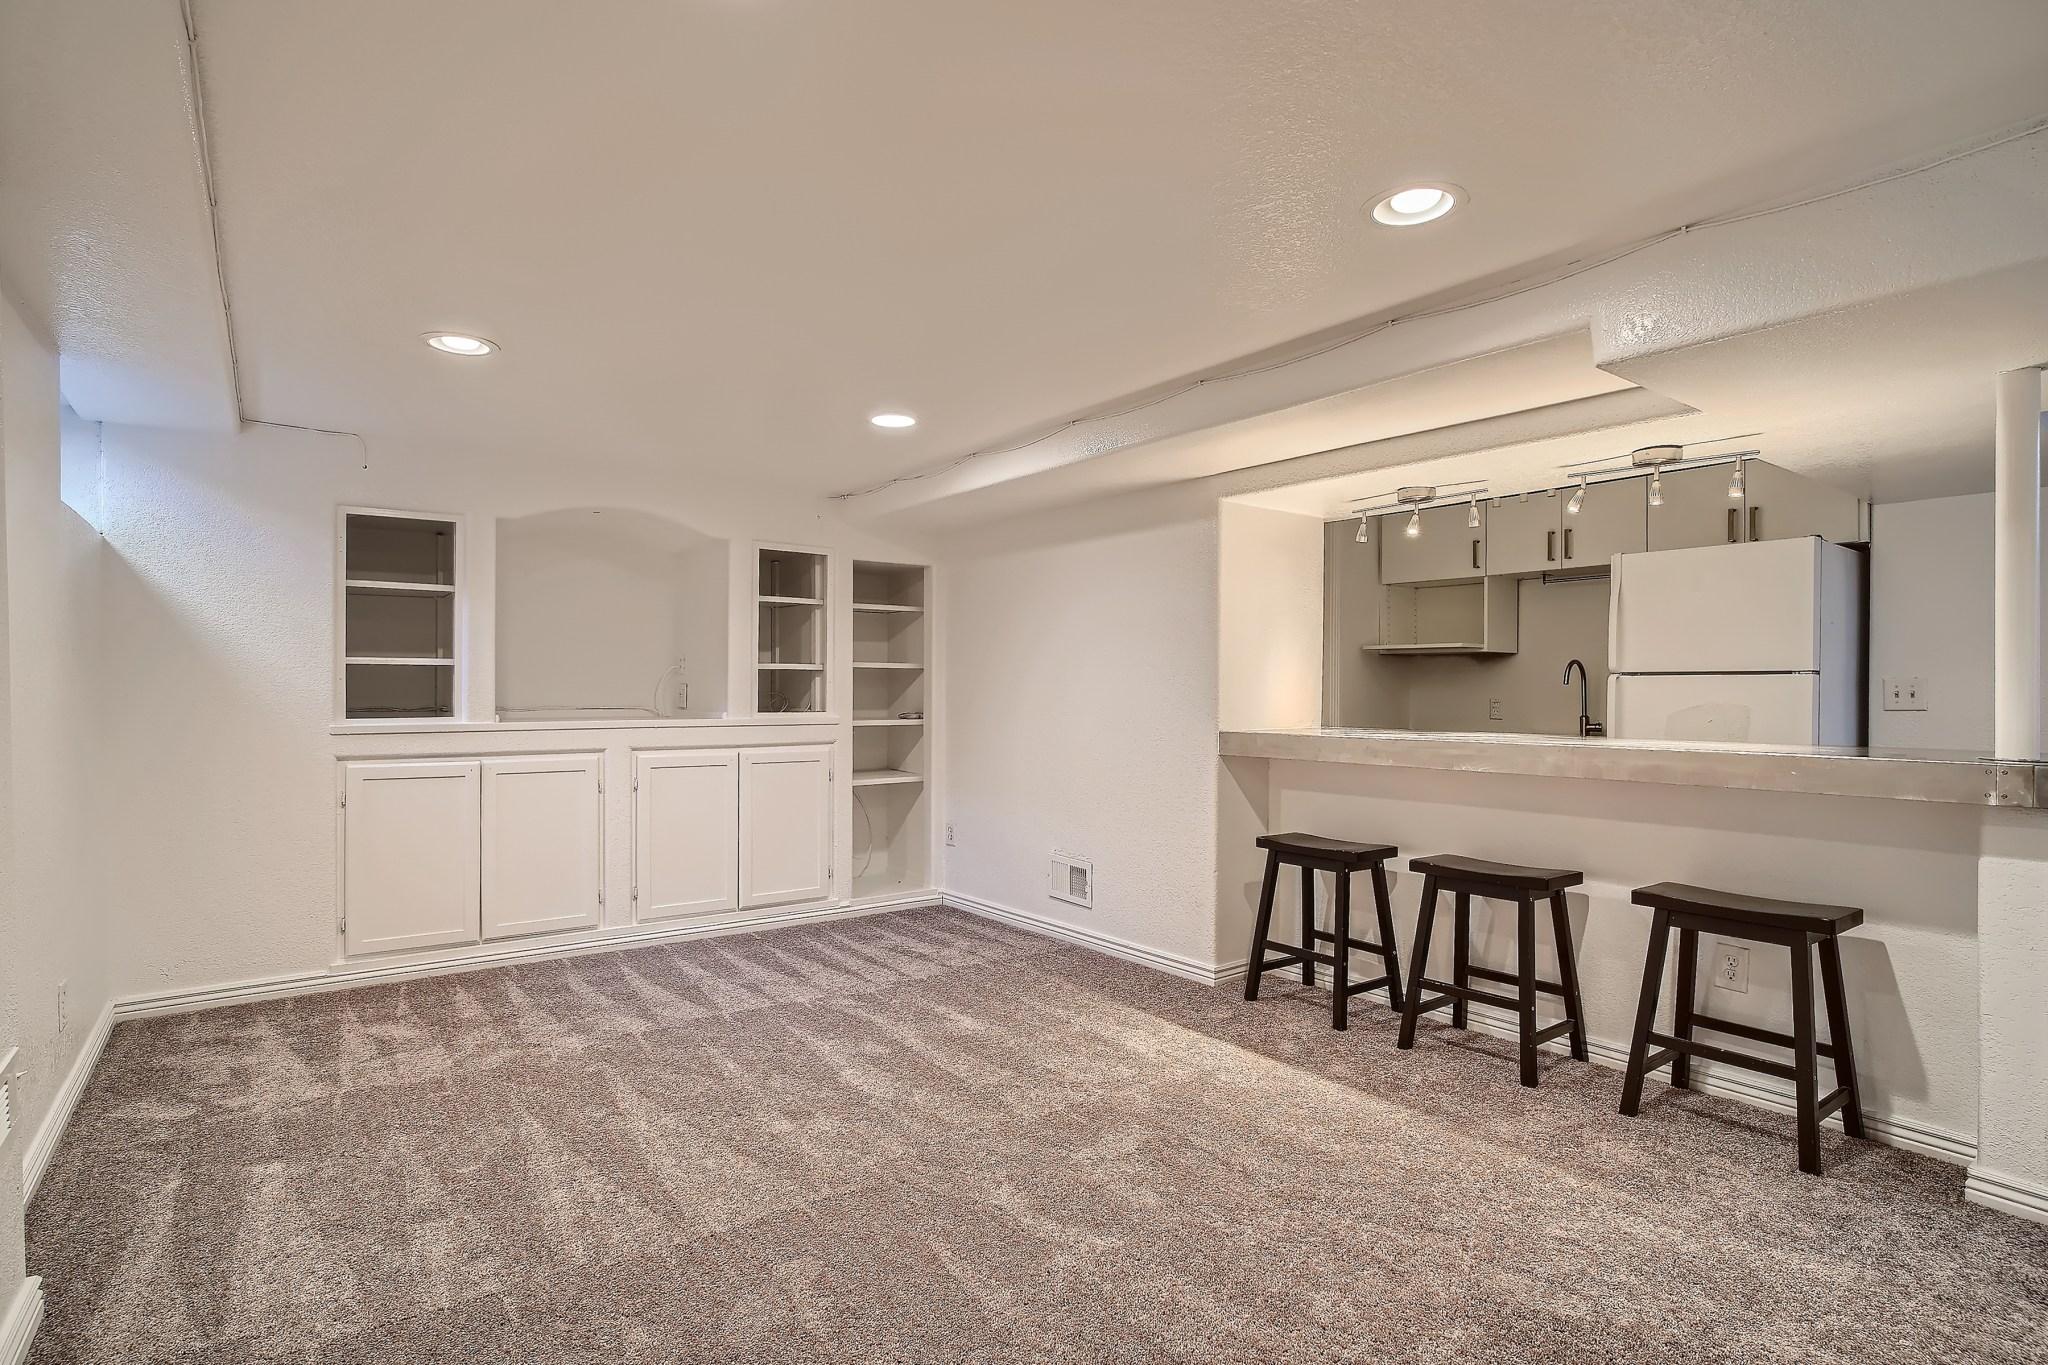 32-Lower-Level-Recreation-Room